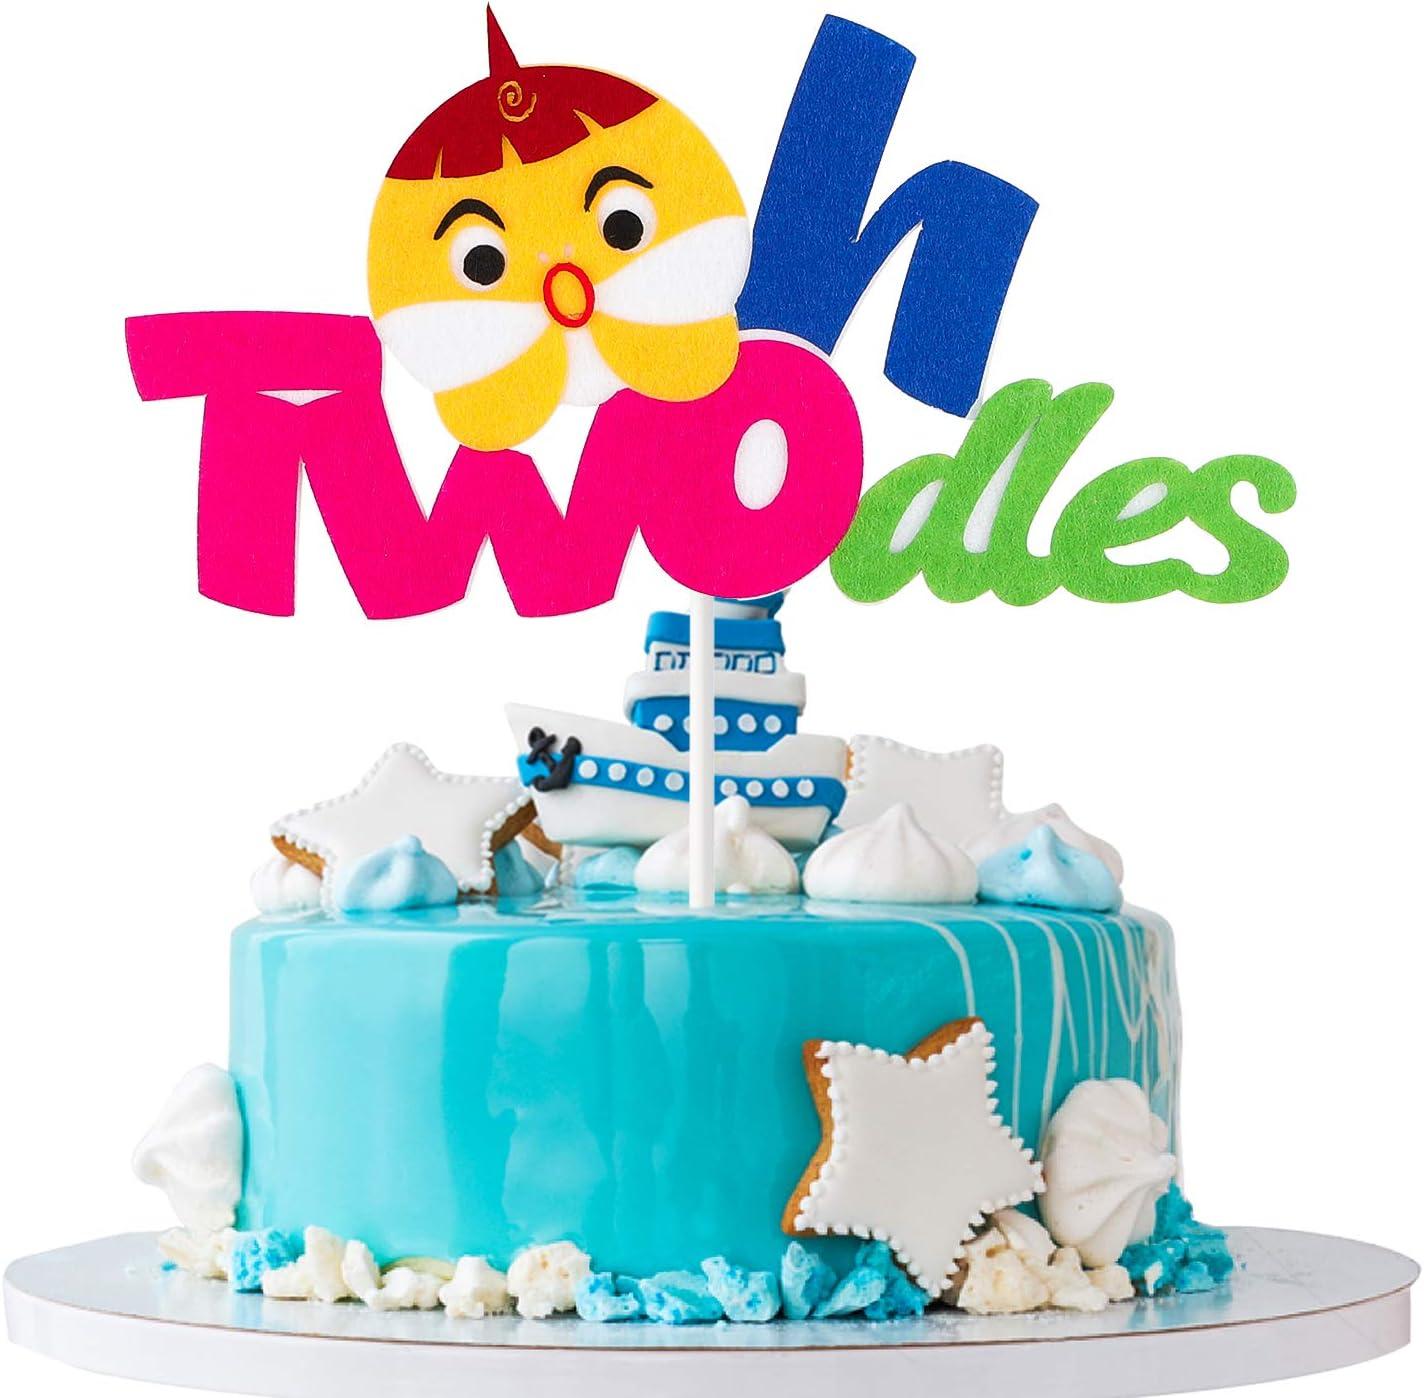 Sensational Mallmall6 Little Shark Two Birthday Cake Topper Twodles Sharks 2Nd Funny Birthday Cards Online Inifodamsfinfo